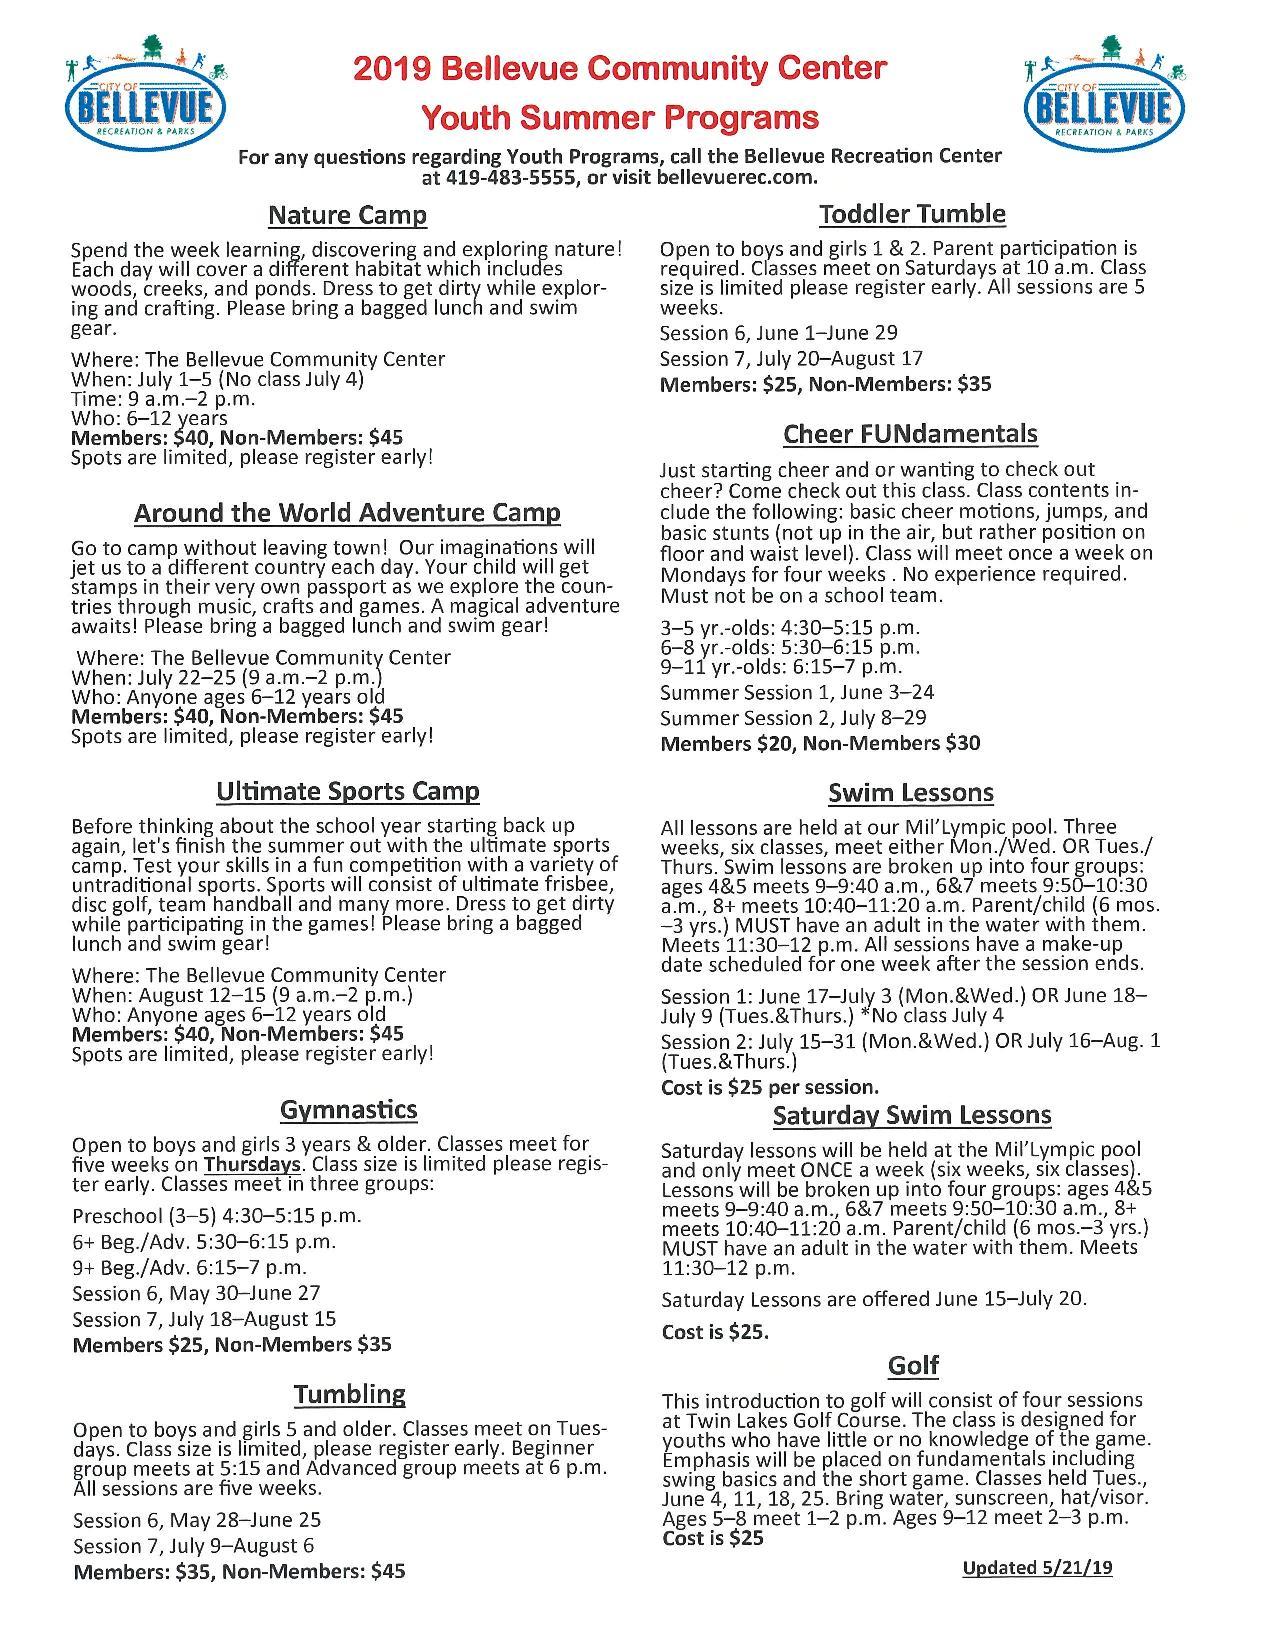 Summer flyer_05212019134039-page-001.jpg